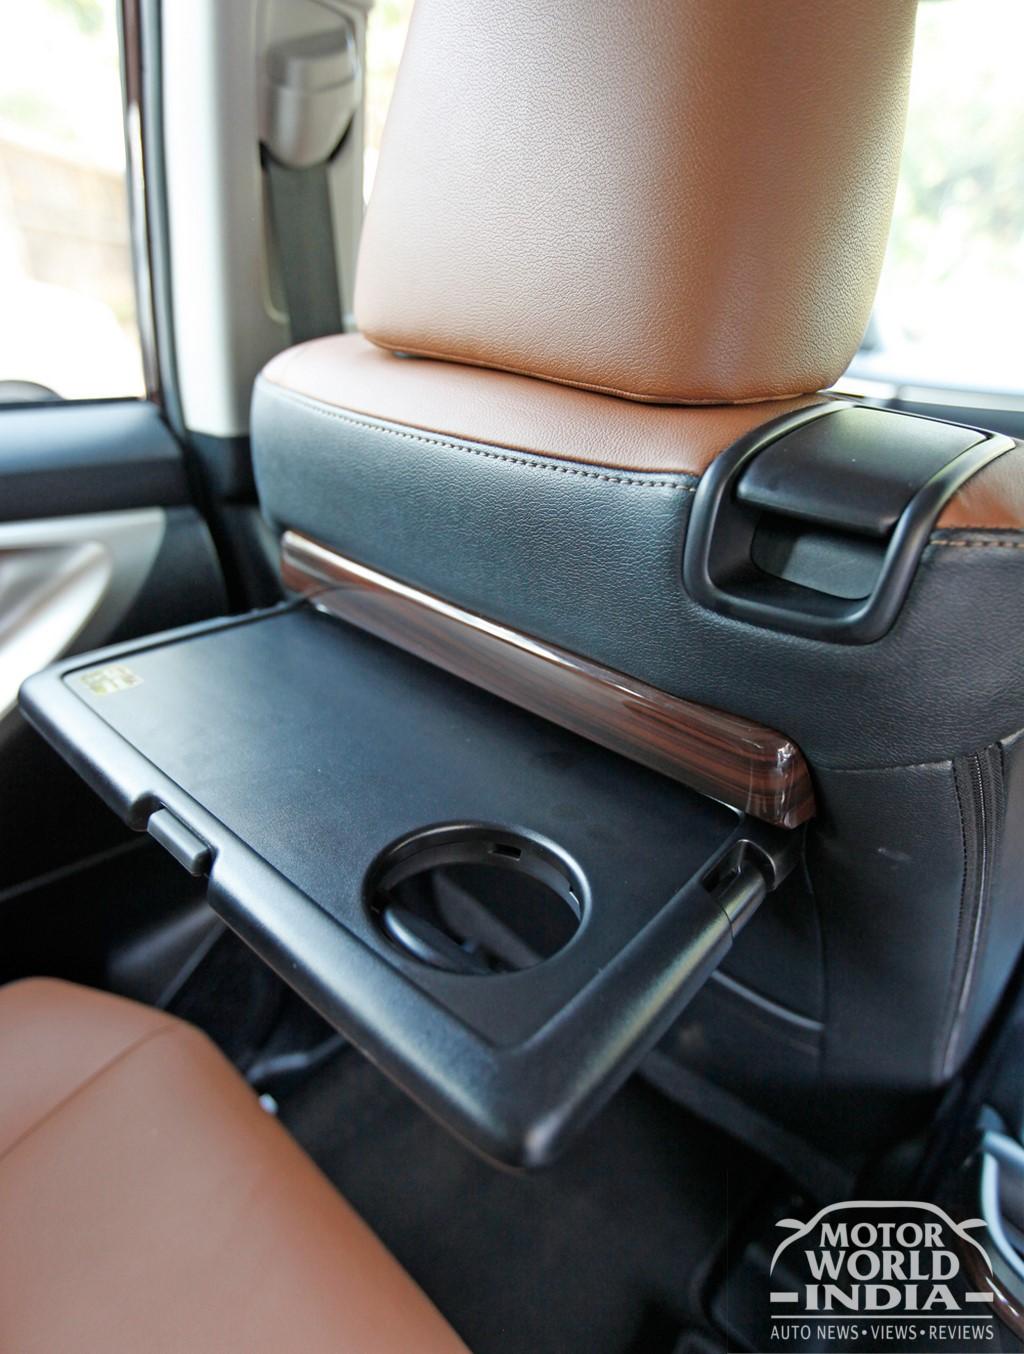 Toyota-Innova-Crysta-Interior-Front-Seat (5)